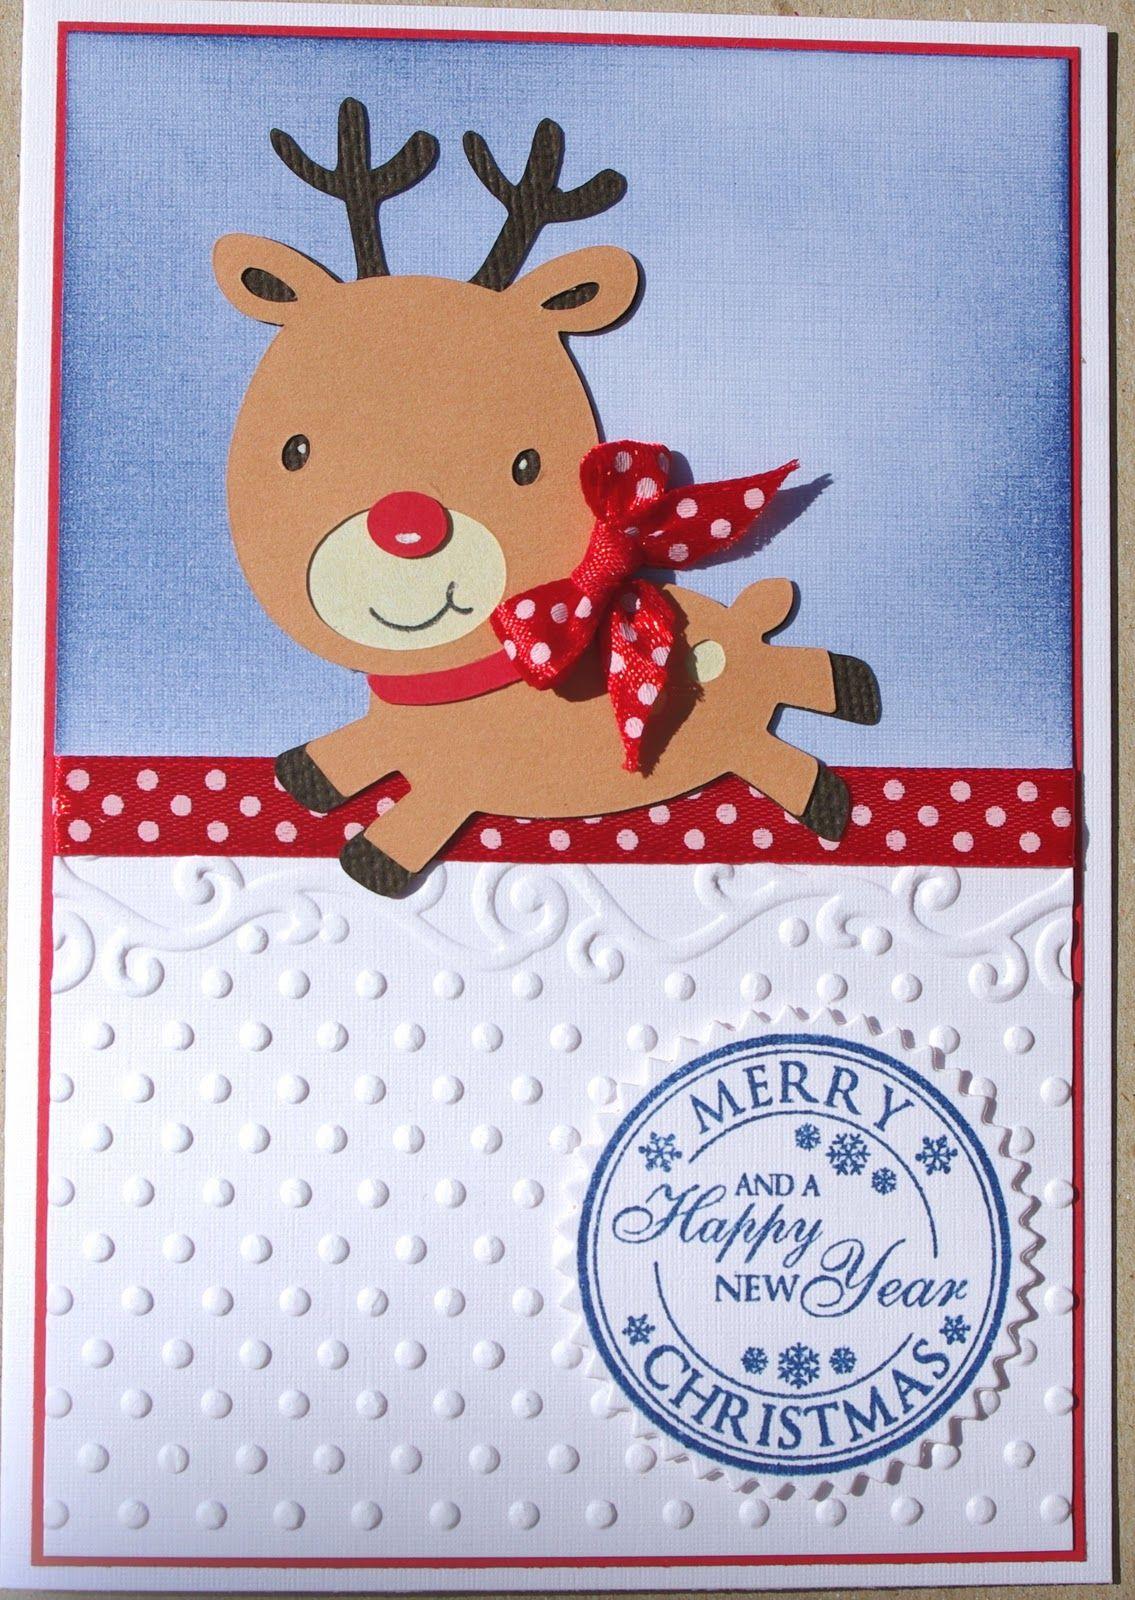 Christmas Card Cricut Create a Critter Reindeer